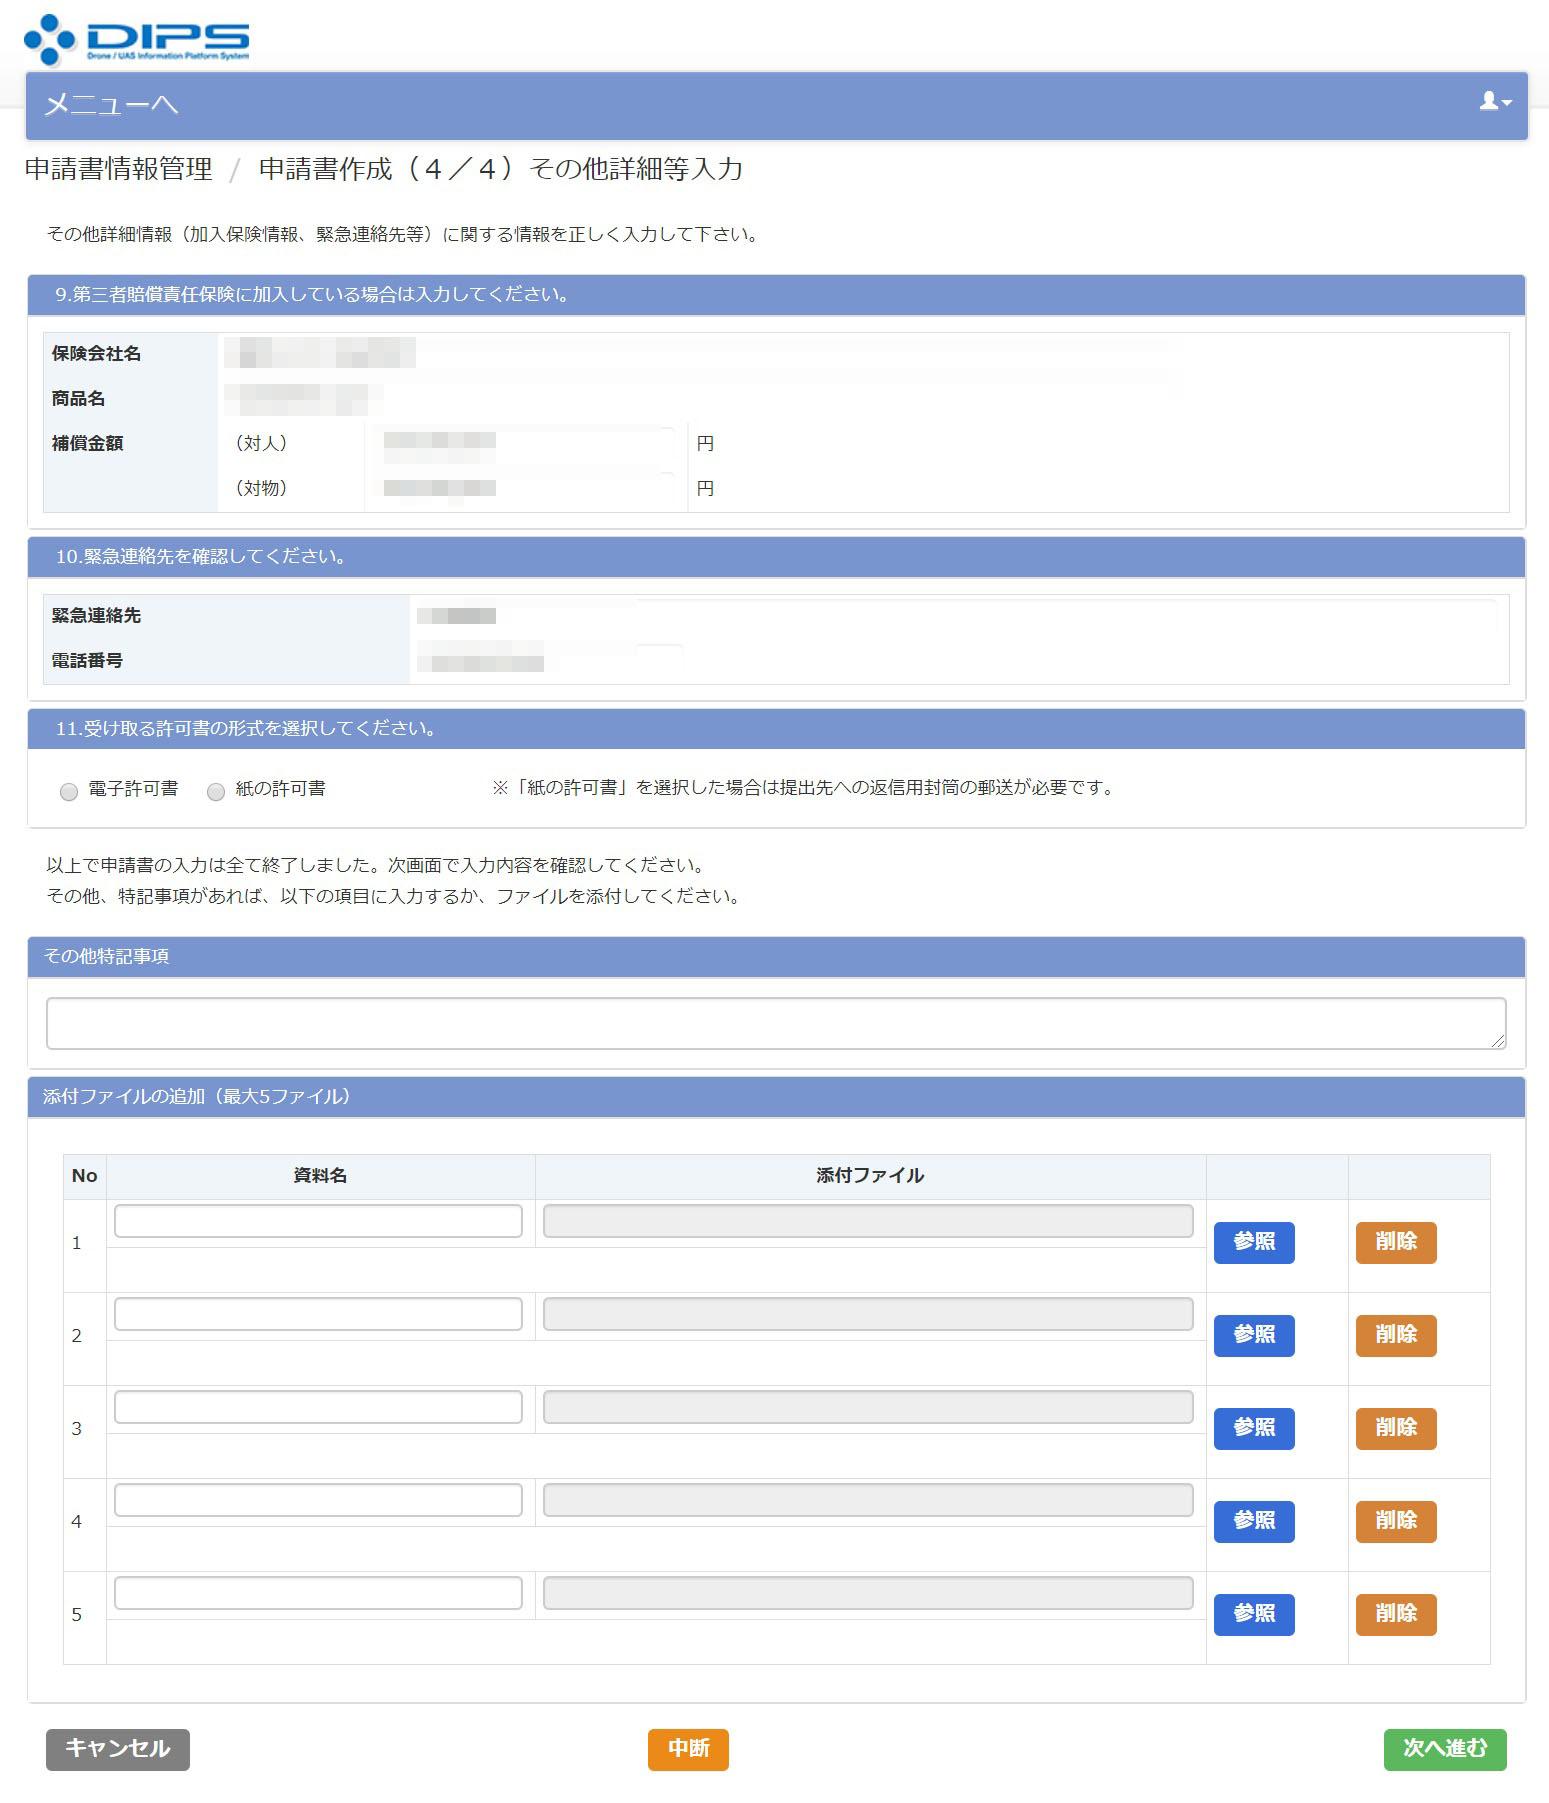 dips申請書作成4ページ目